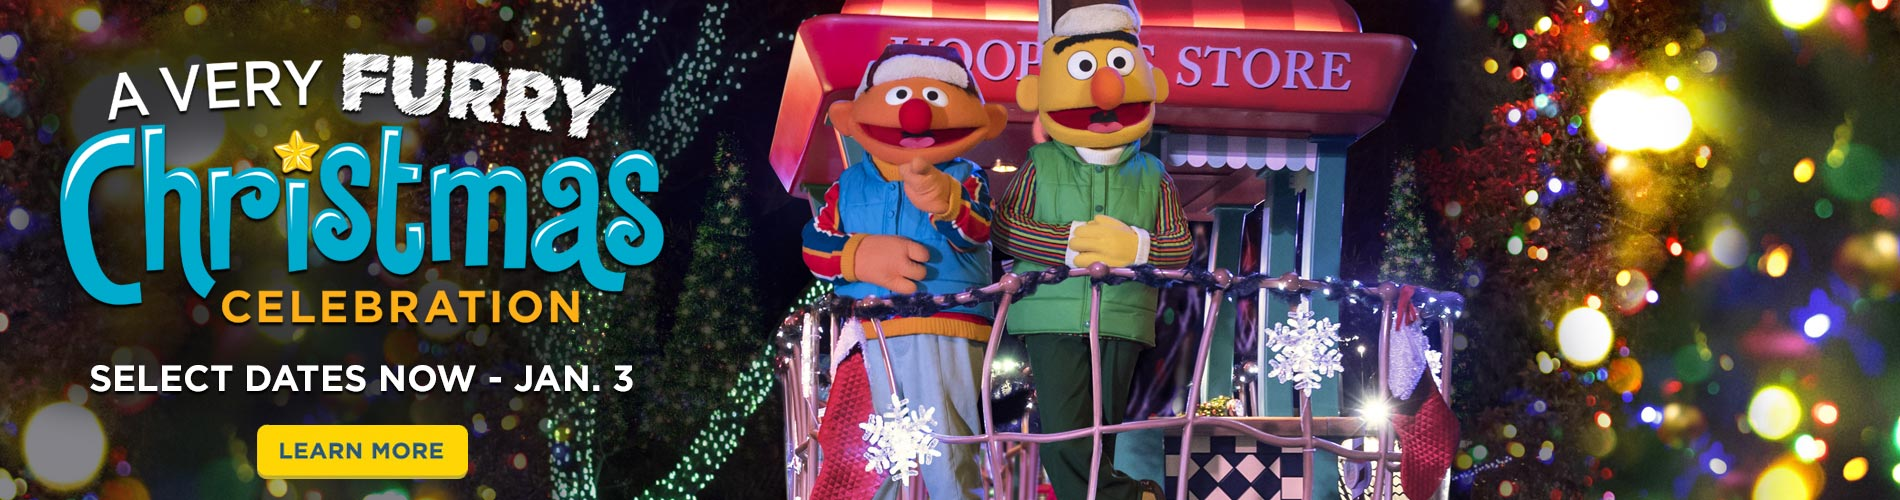 A Very Furry Christmas Celebration at Sesame Place